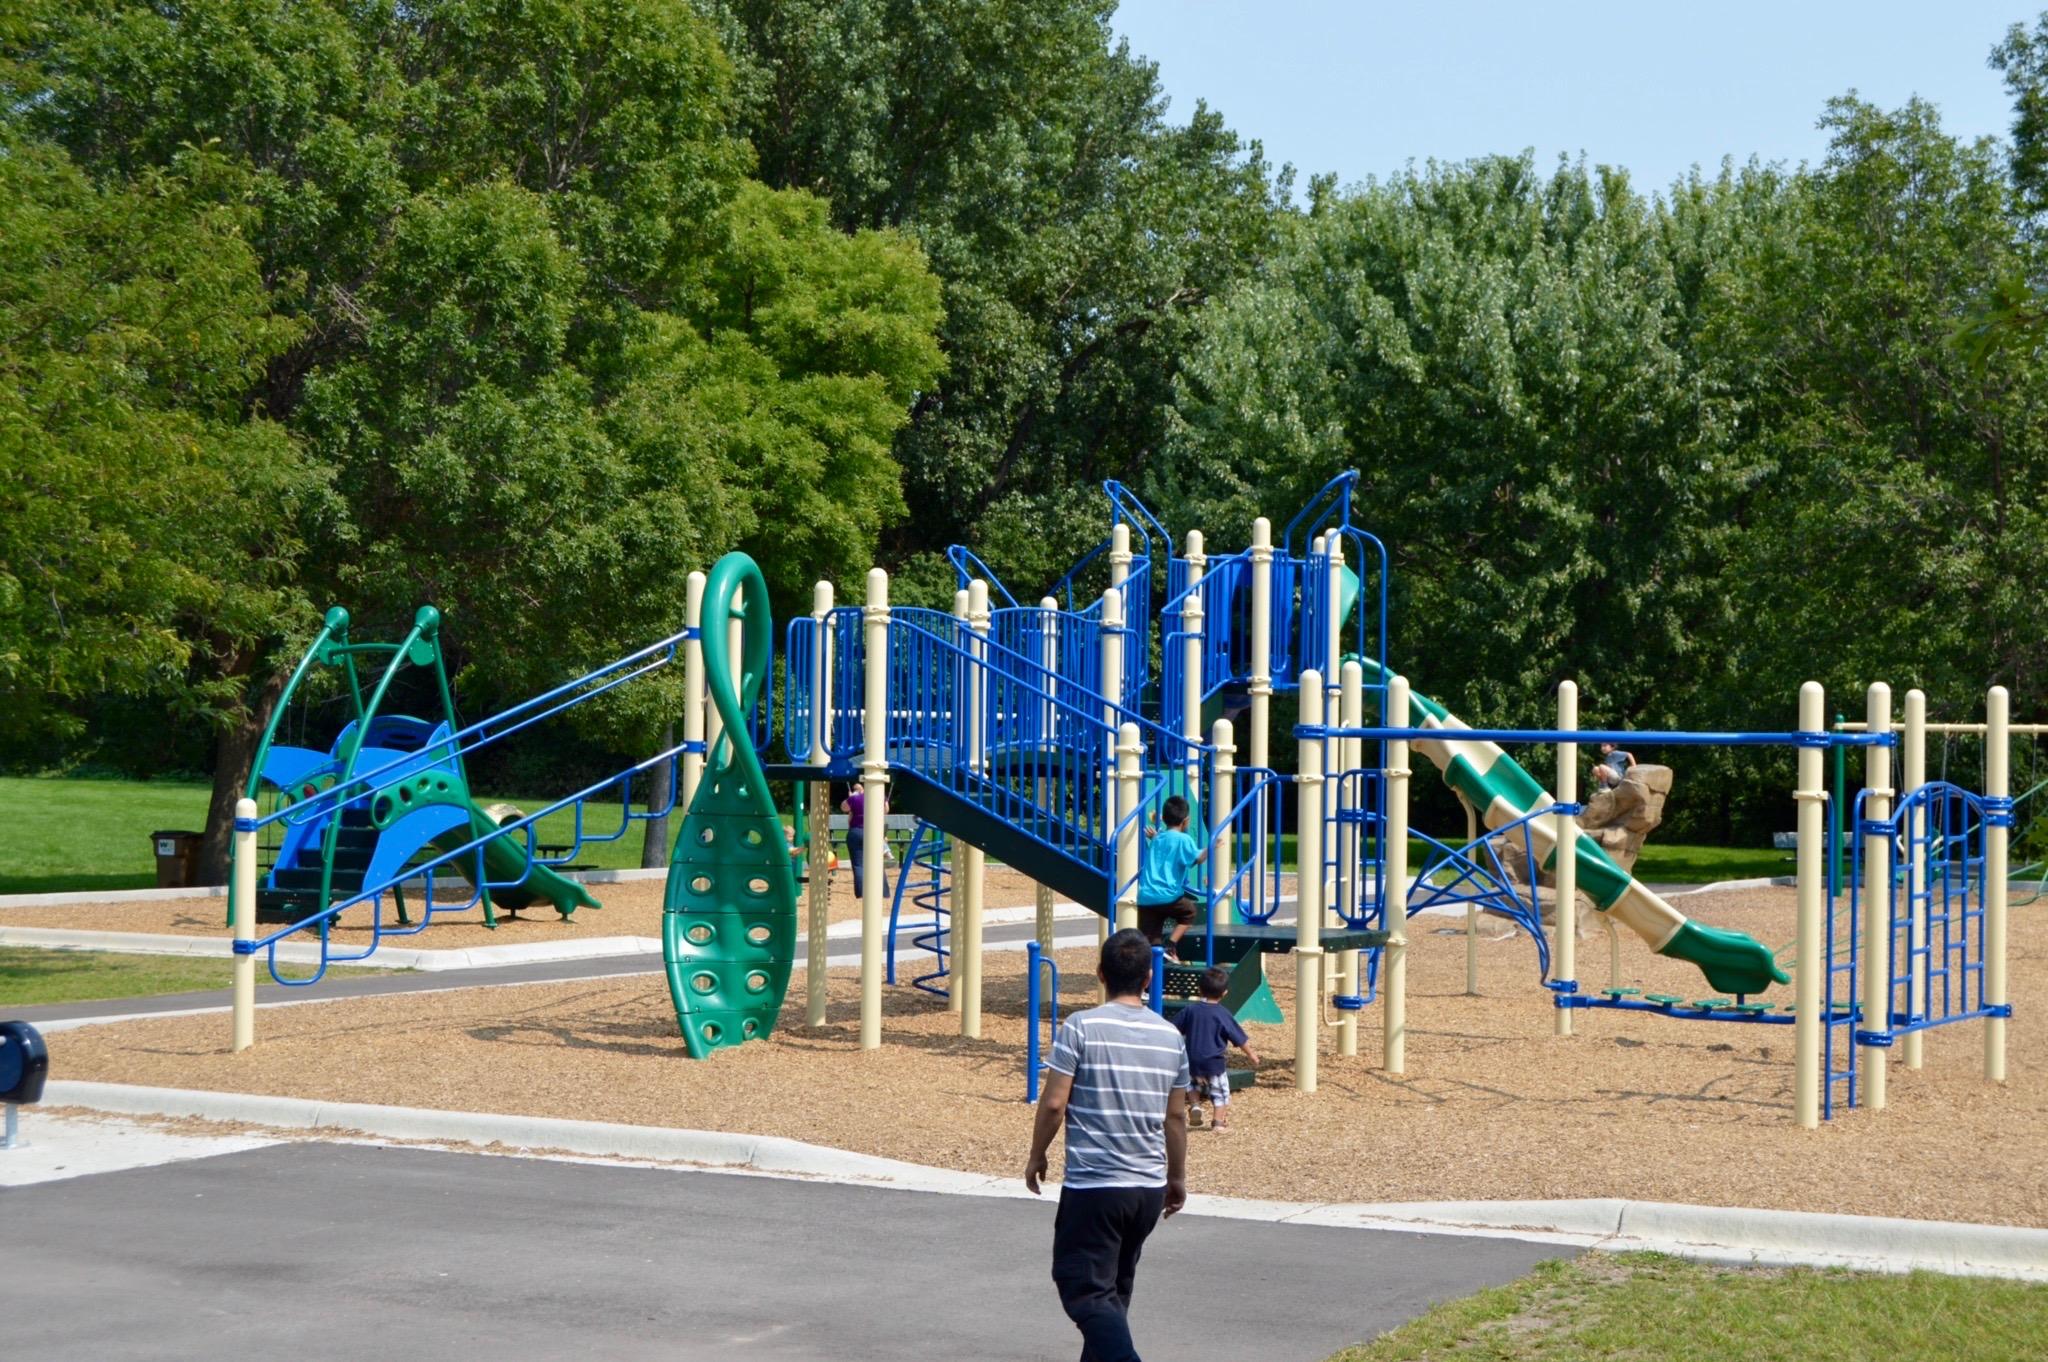 Veteran's Memorial Park, Richfield, MN